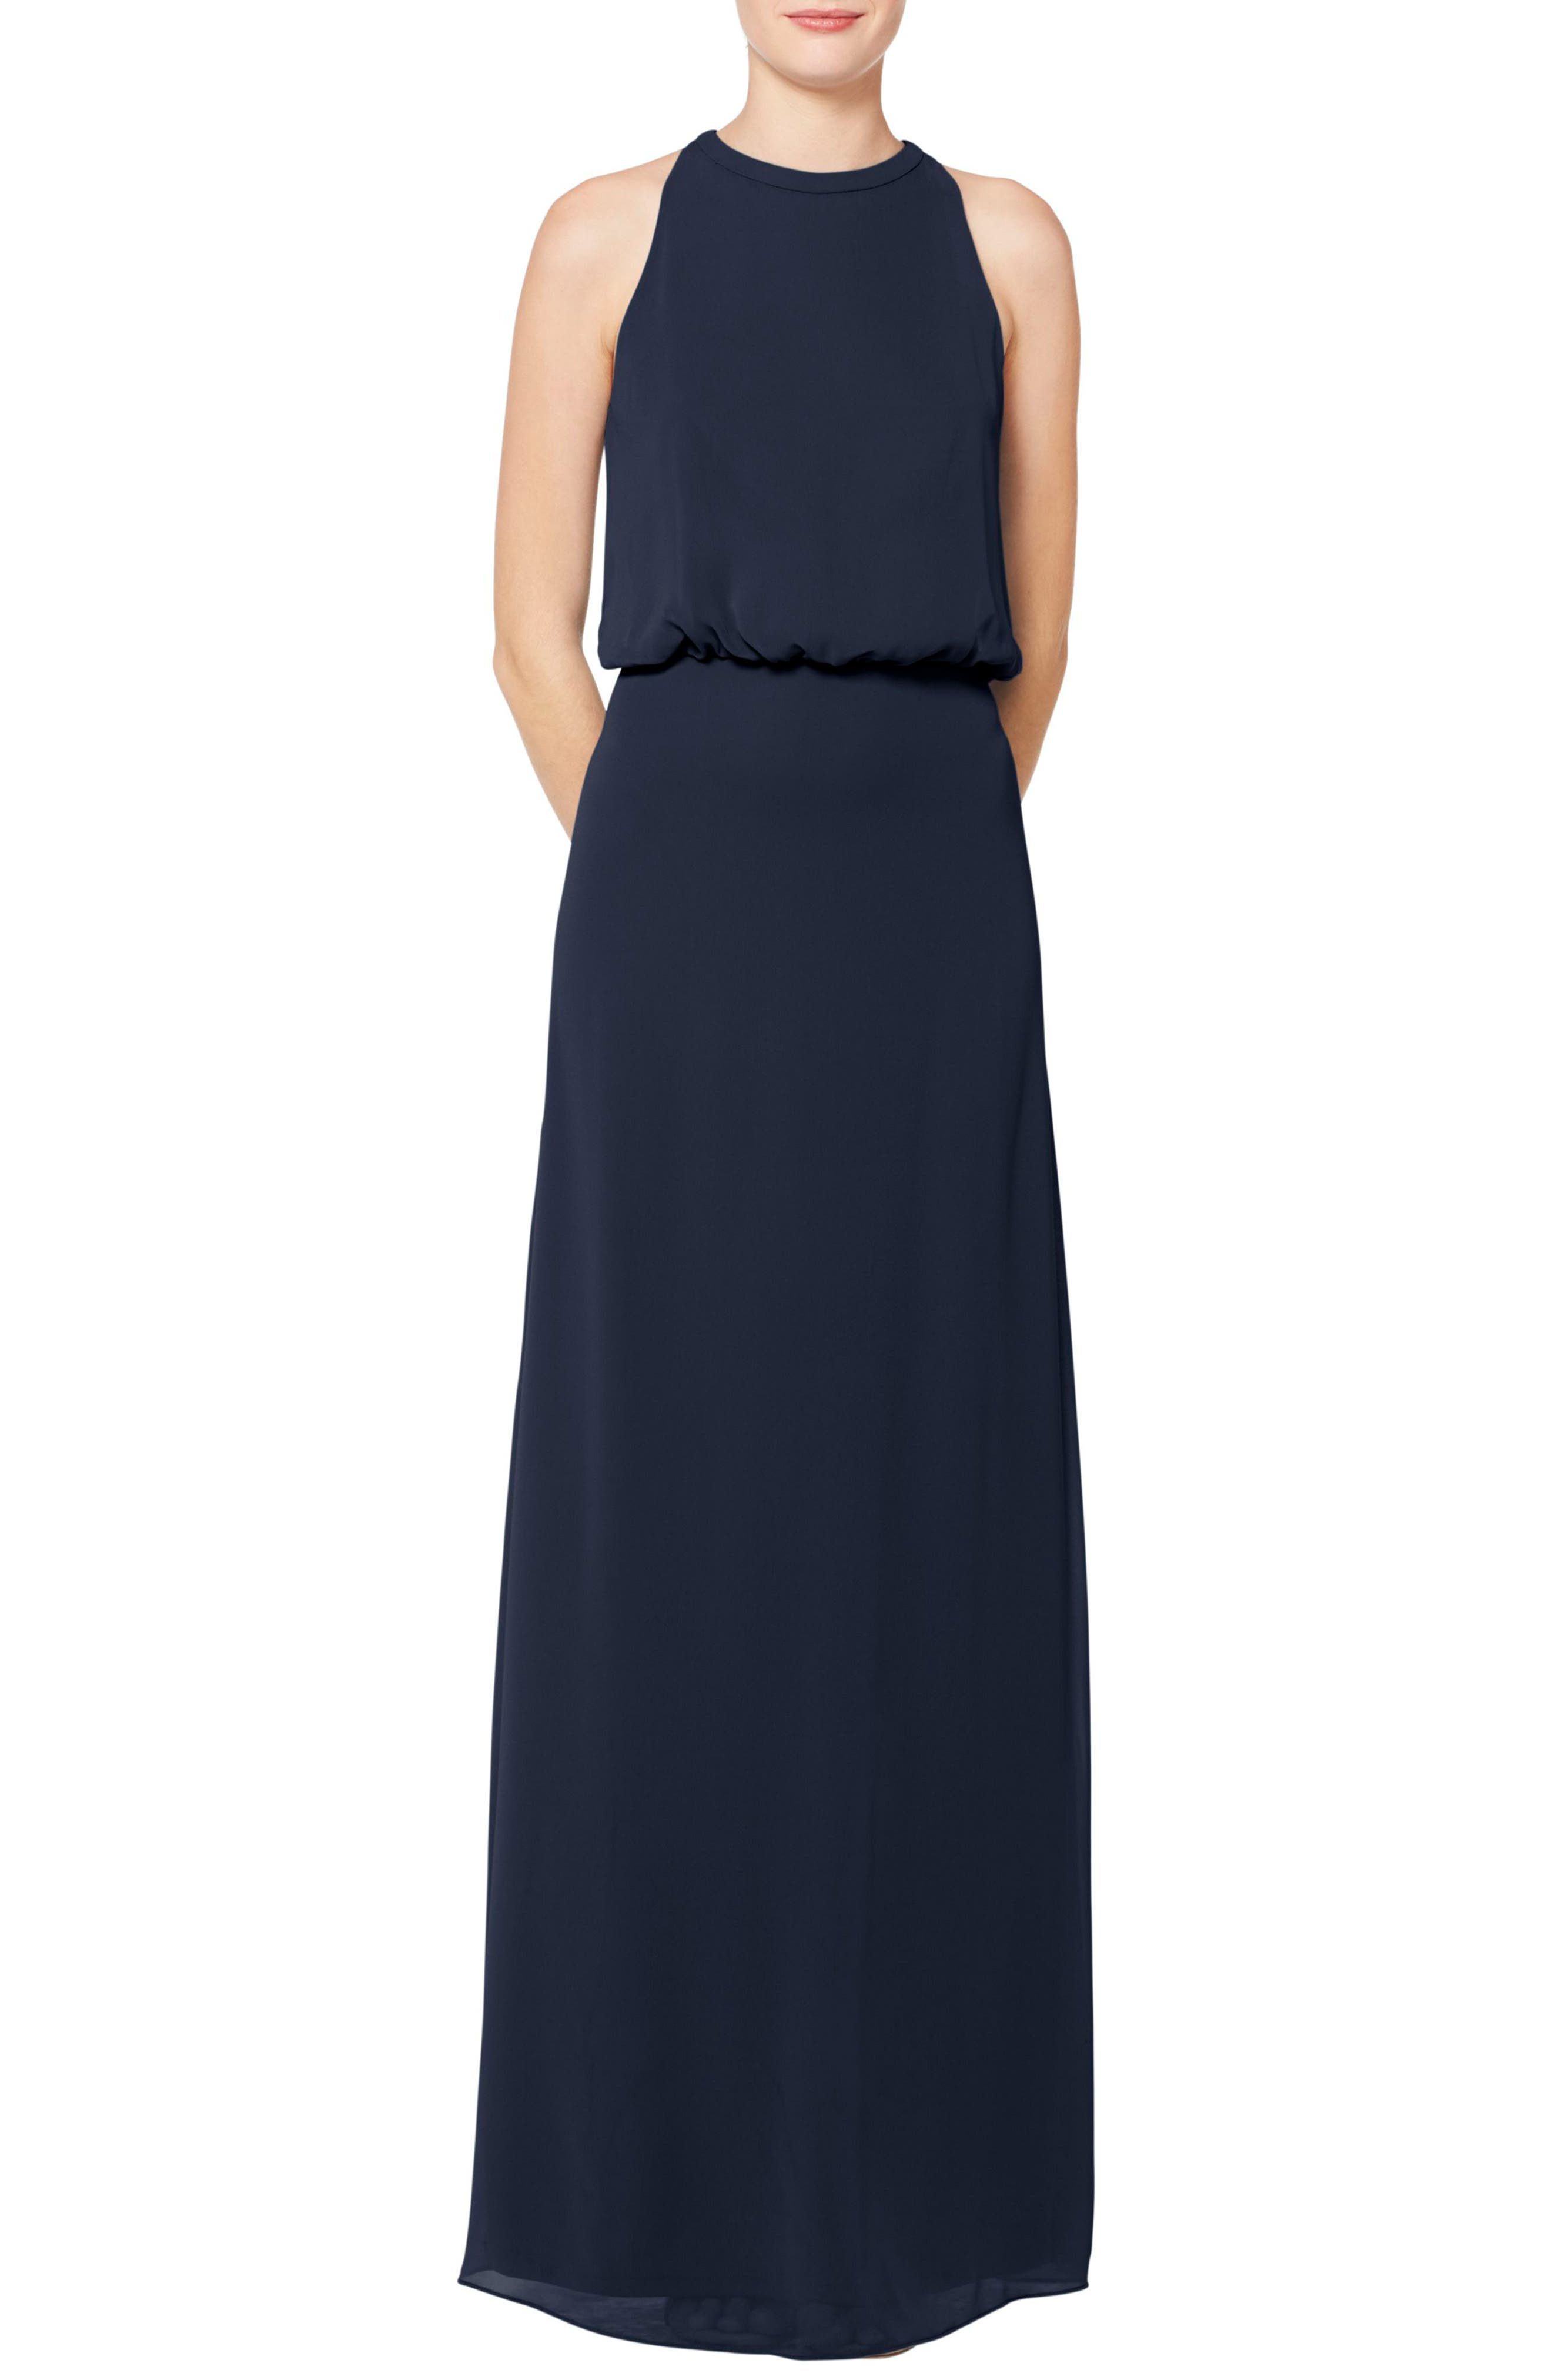 #LEVKOFF, Halter Neck Blouson Bodice Chiffon Evening Dress, Main thumbnail 1, color, NAVY